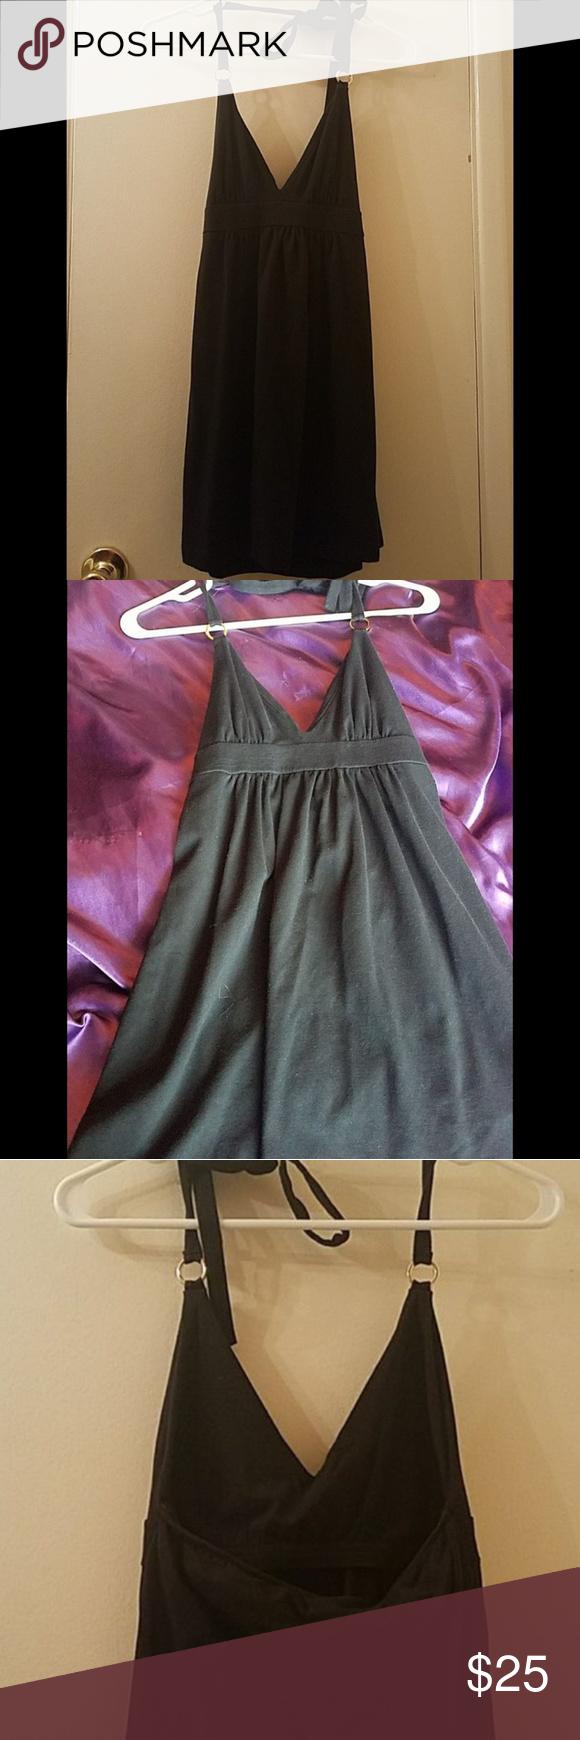 Victoria S Secret Mini Summer Beach Dress Xs Beach Dresses Summer Mini Dresses Summer Dresses Xs [ 1740 x 580 Pixel ]